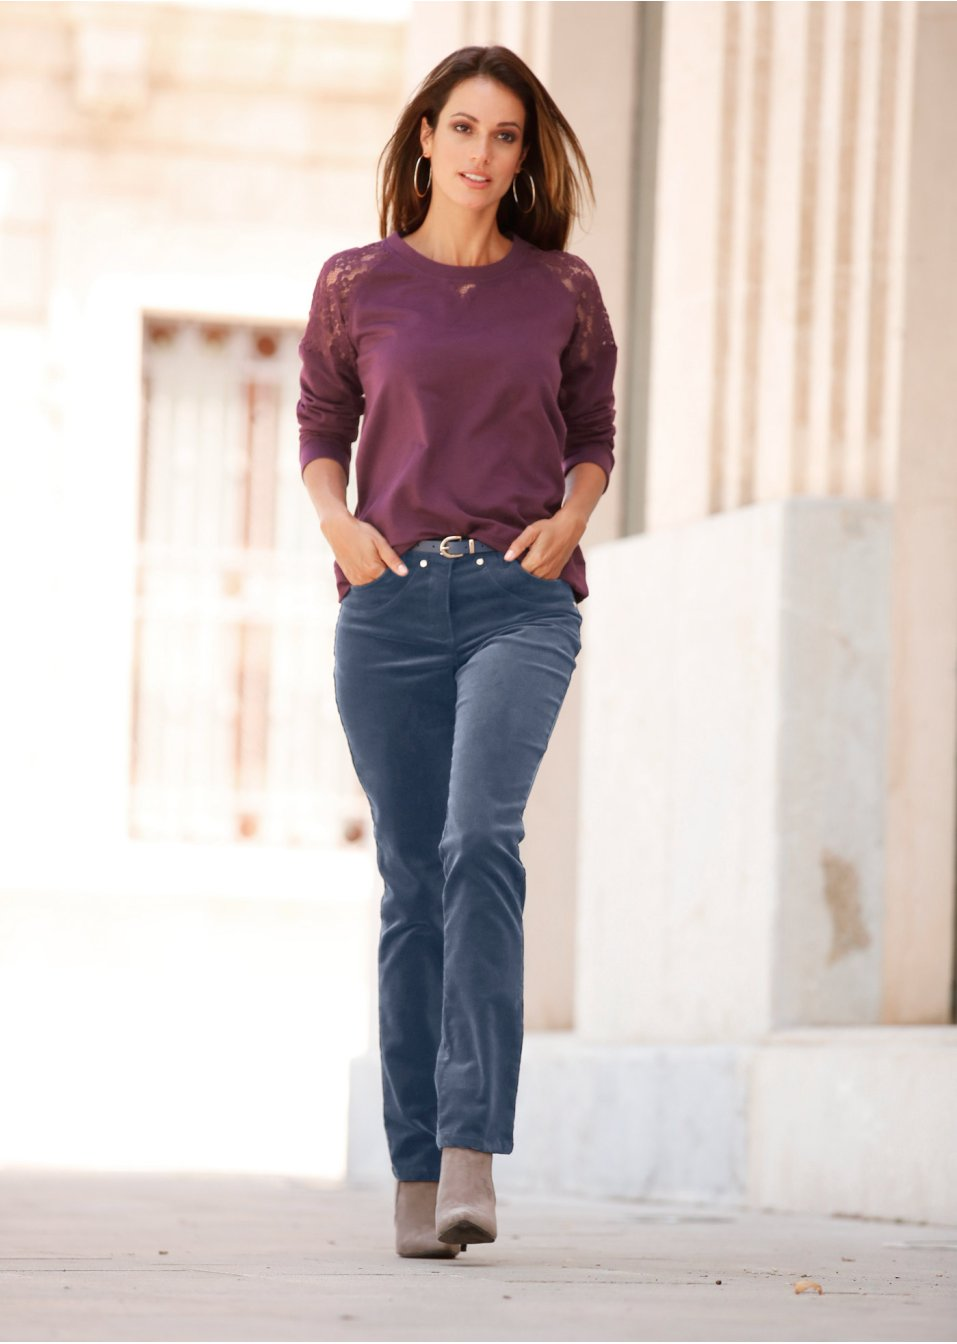 e67015f7b7909 Pantalon velours côtelé extensible rose dragée - Femme - bpc selection -  bonprix.fr